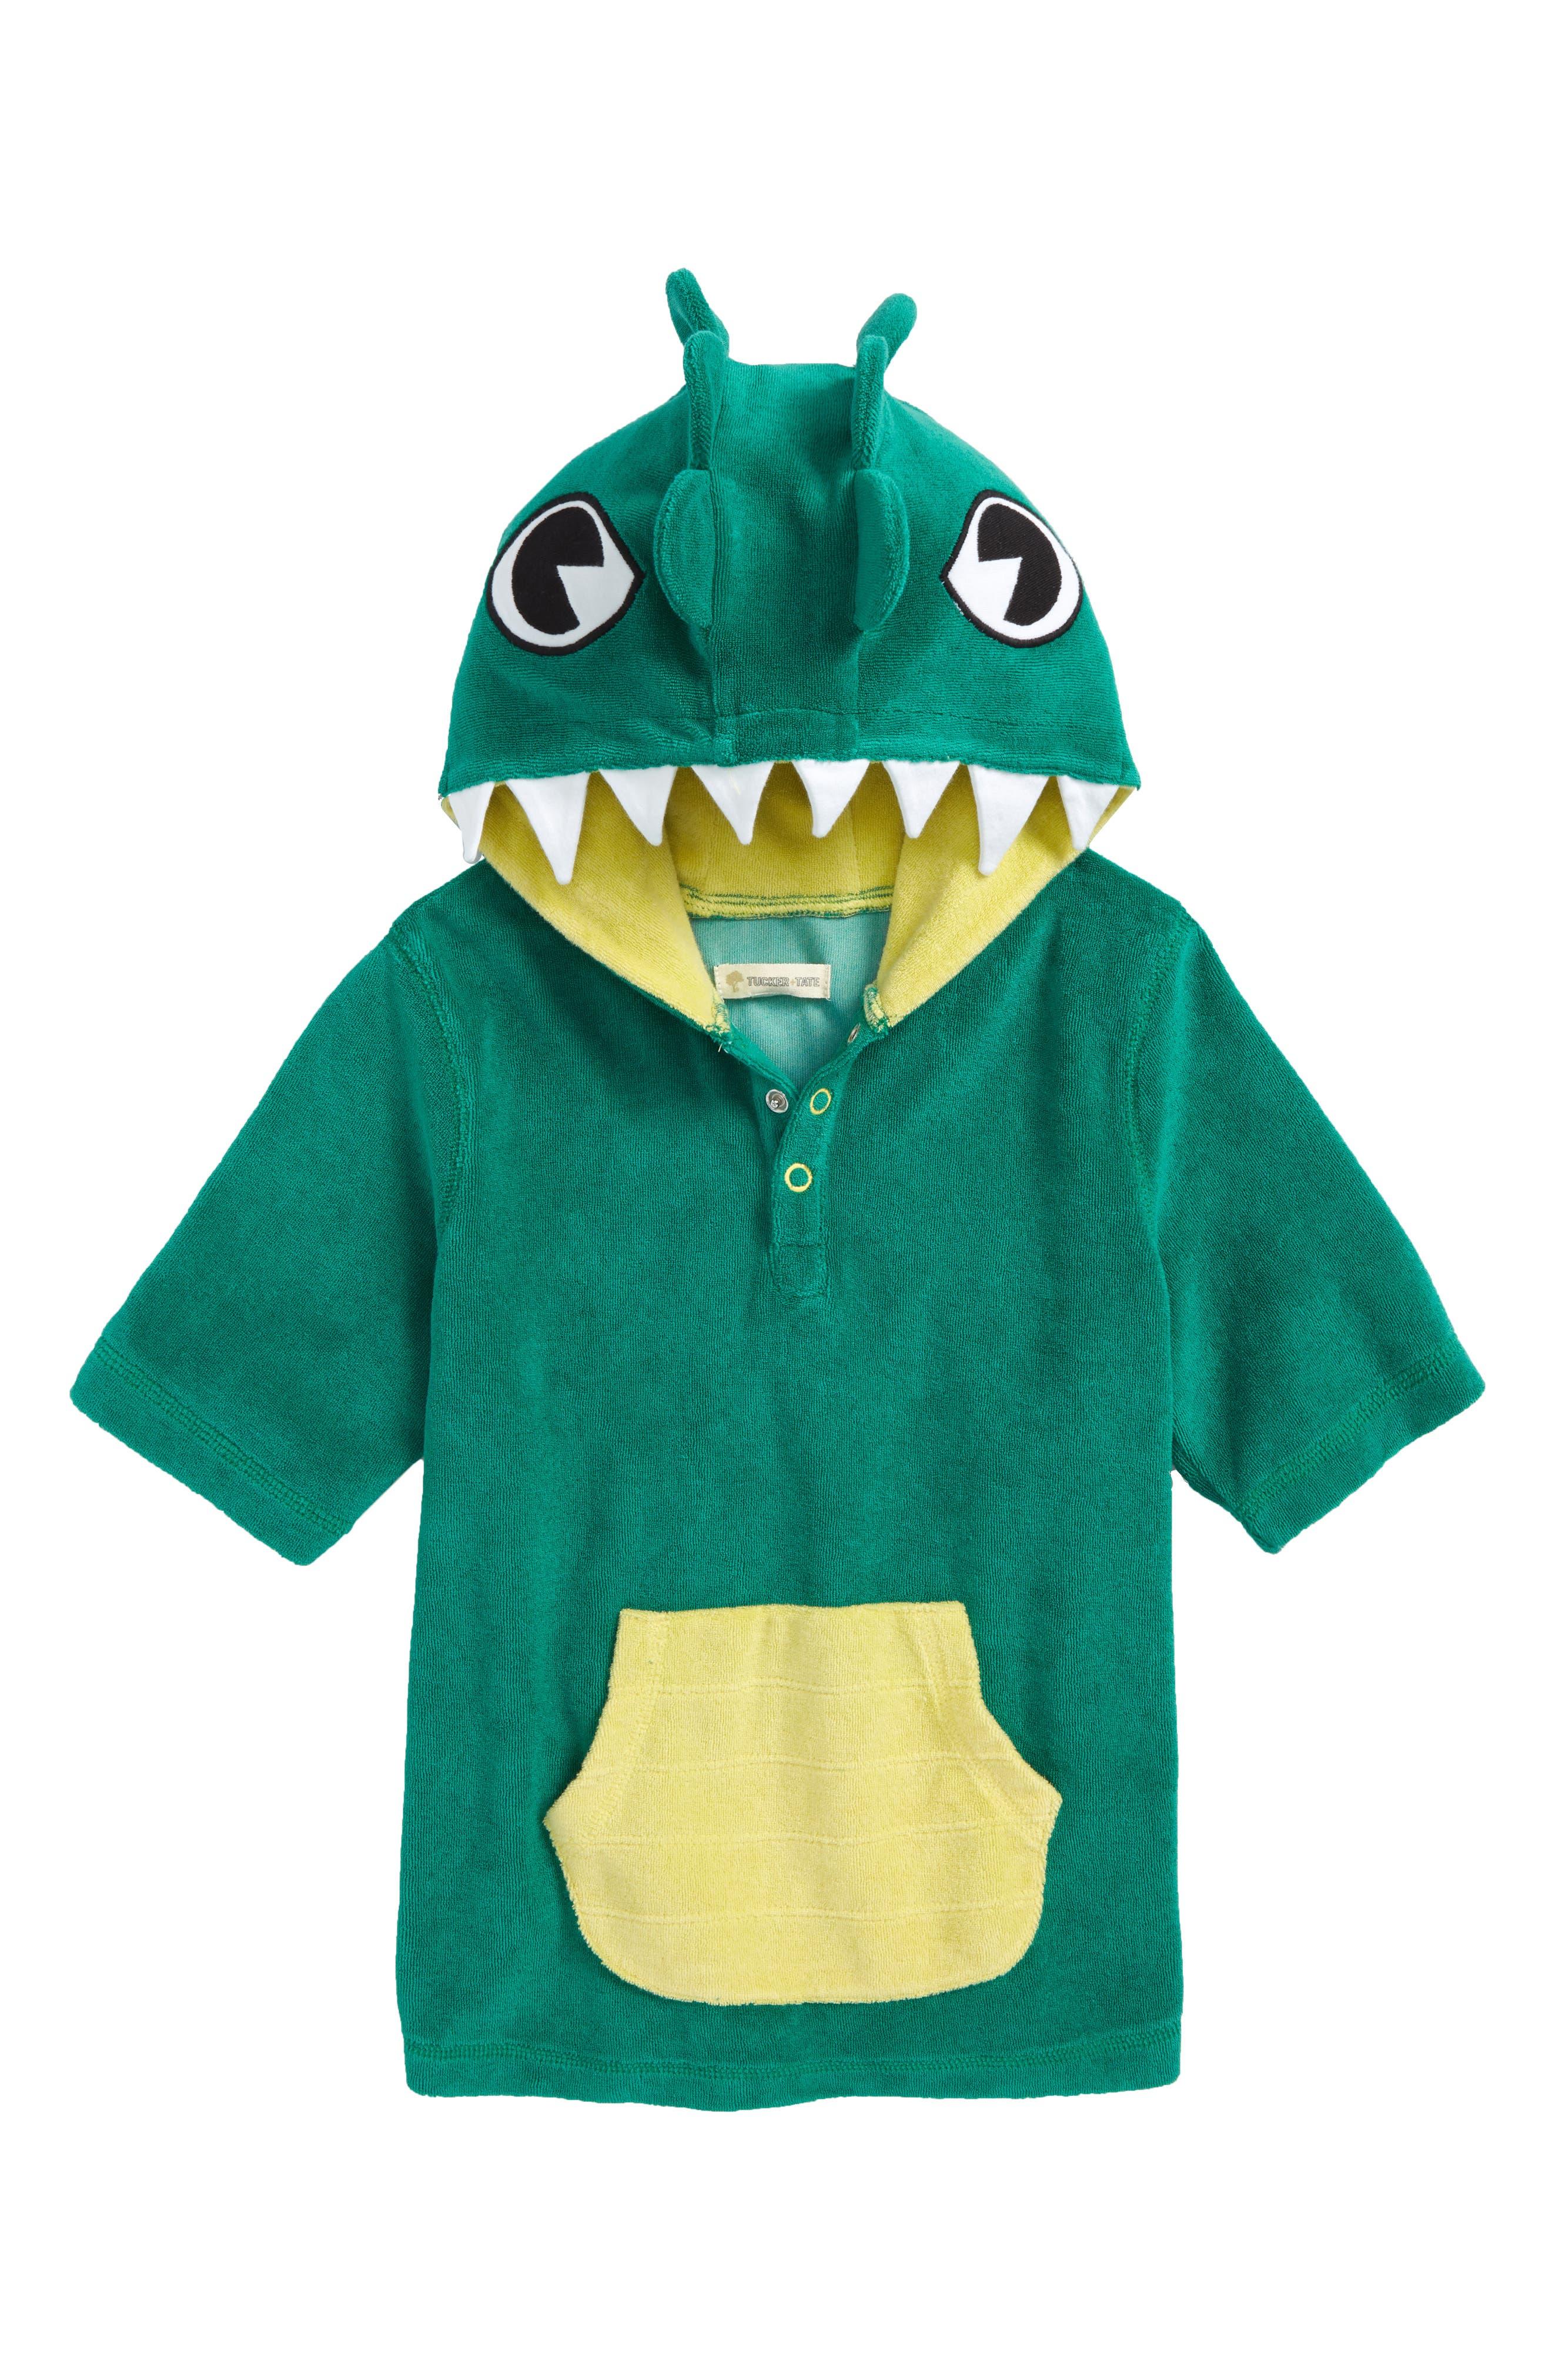 Green Lake Gator Towel Cover-Up,                         Main,                         color, 310